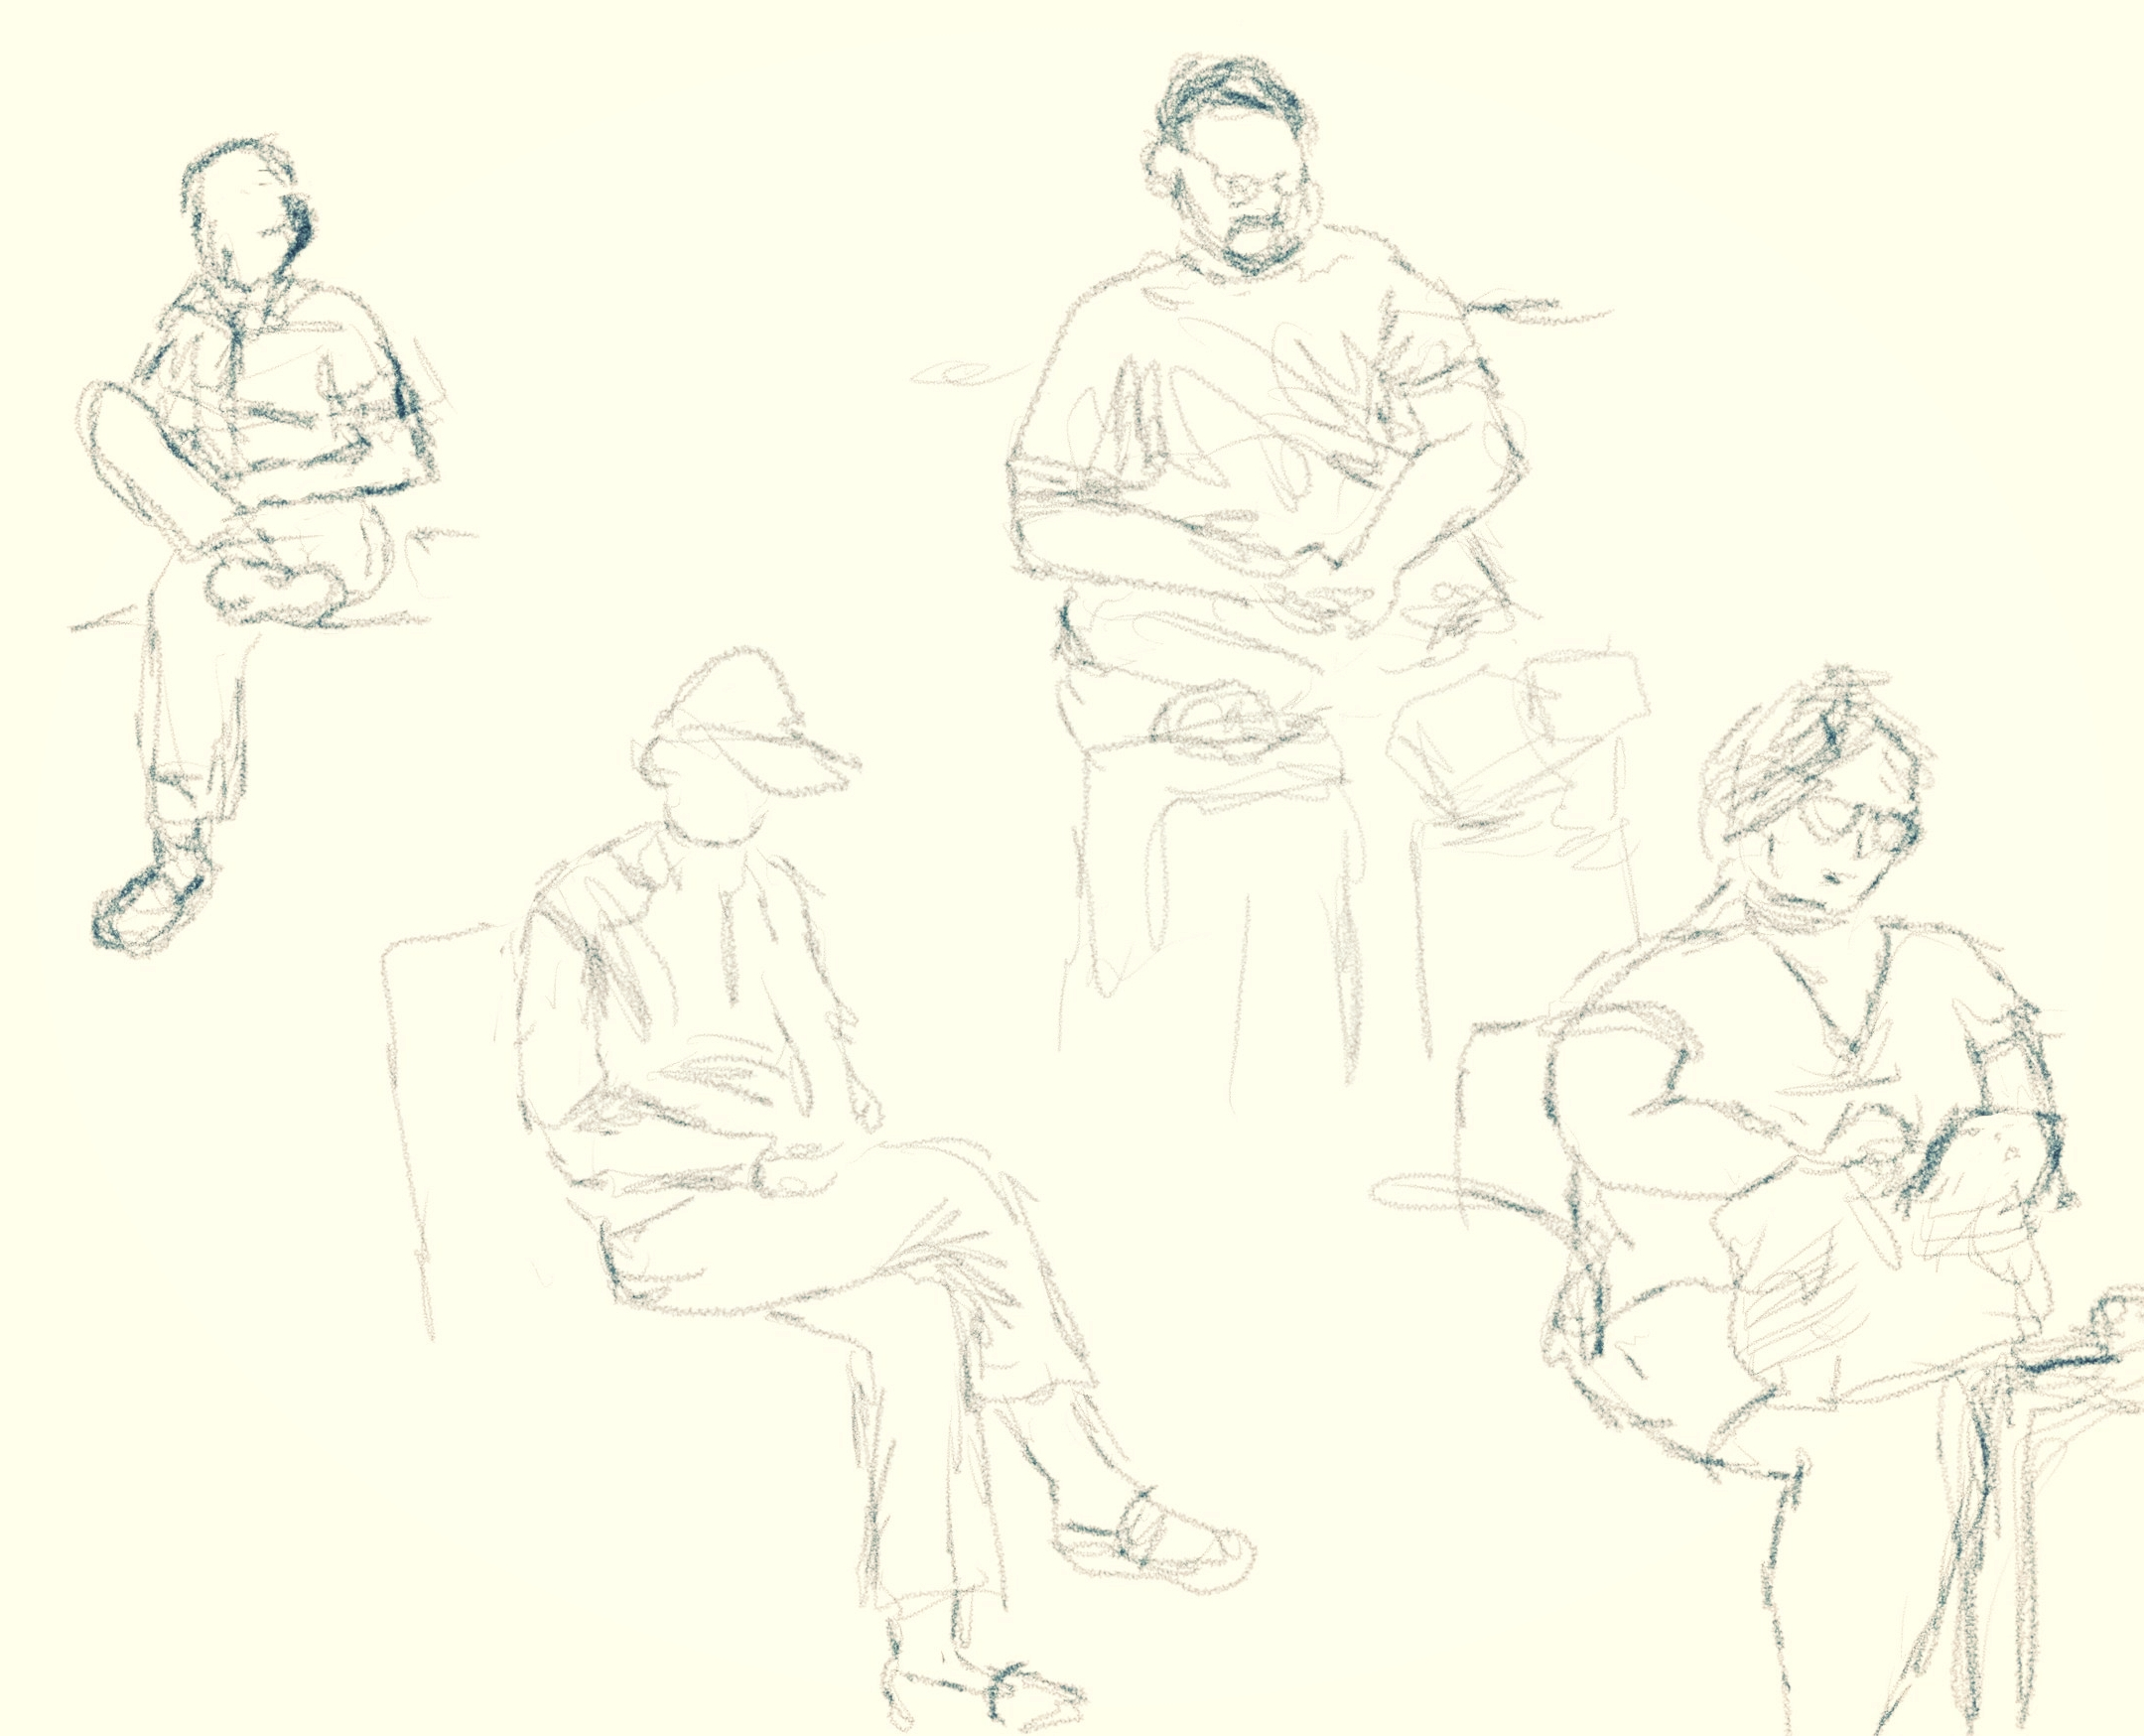 I did all of them on iPad Pro with Apple Pencil on Procreate.